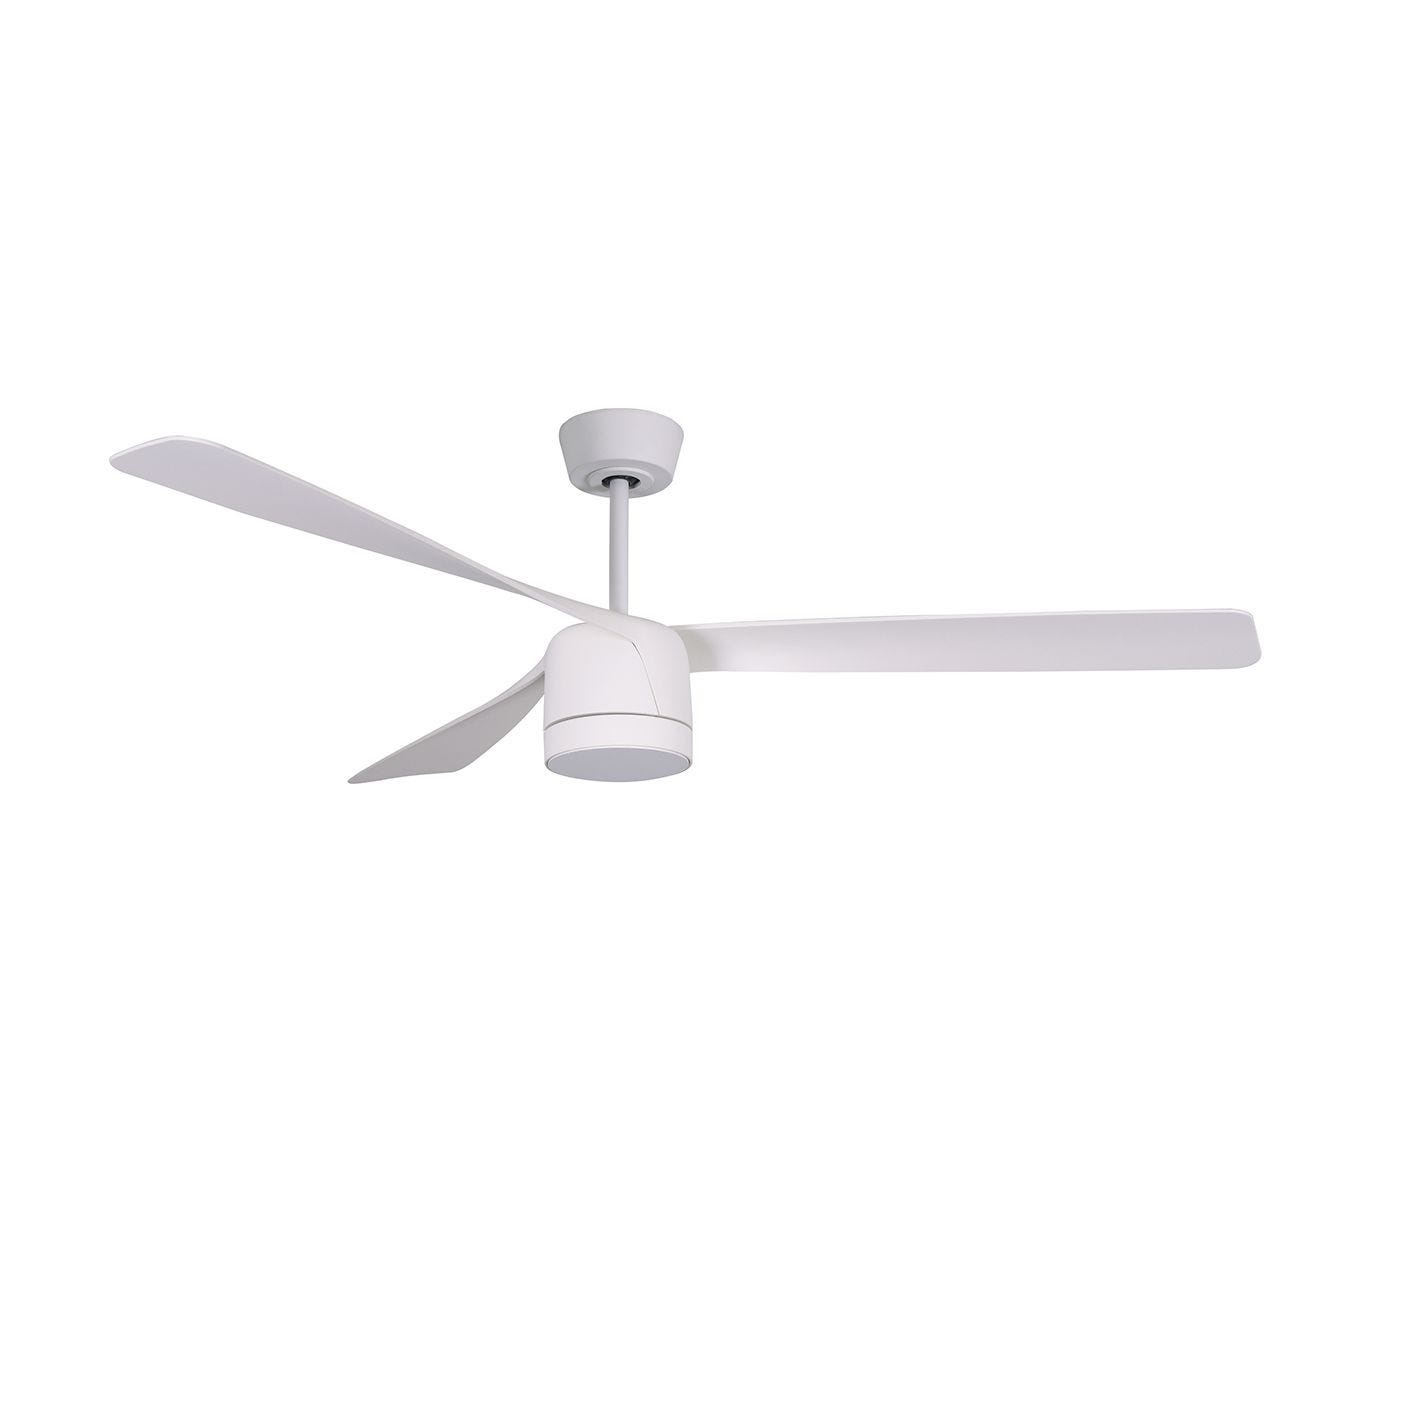 Stropný ventilátor Lucci Air Peregrine 213280